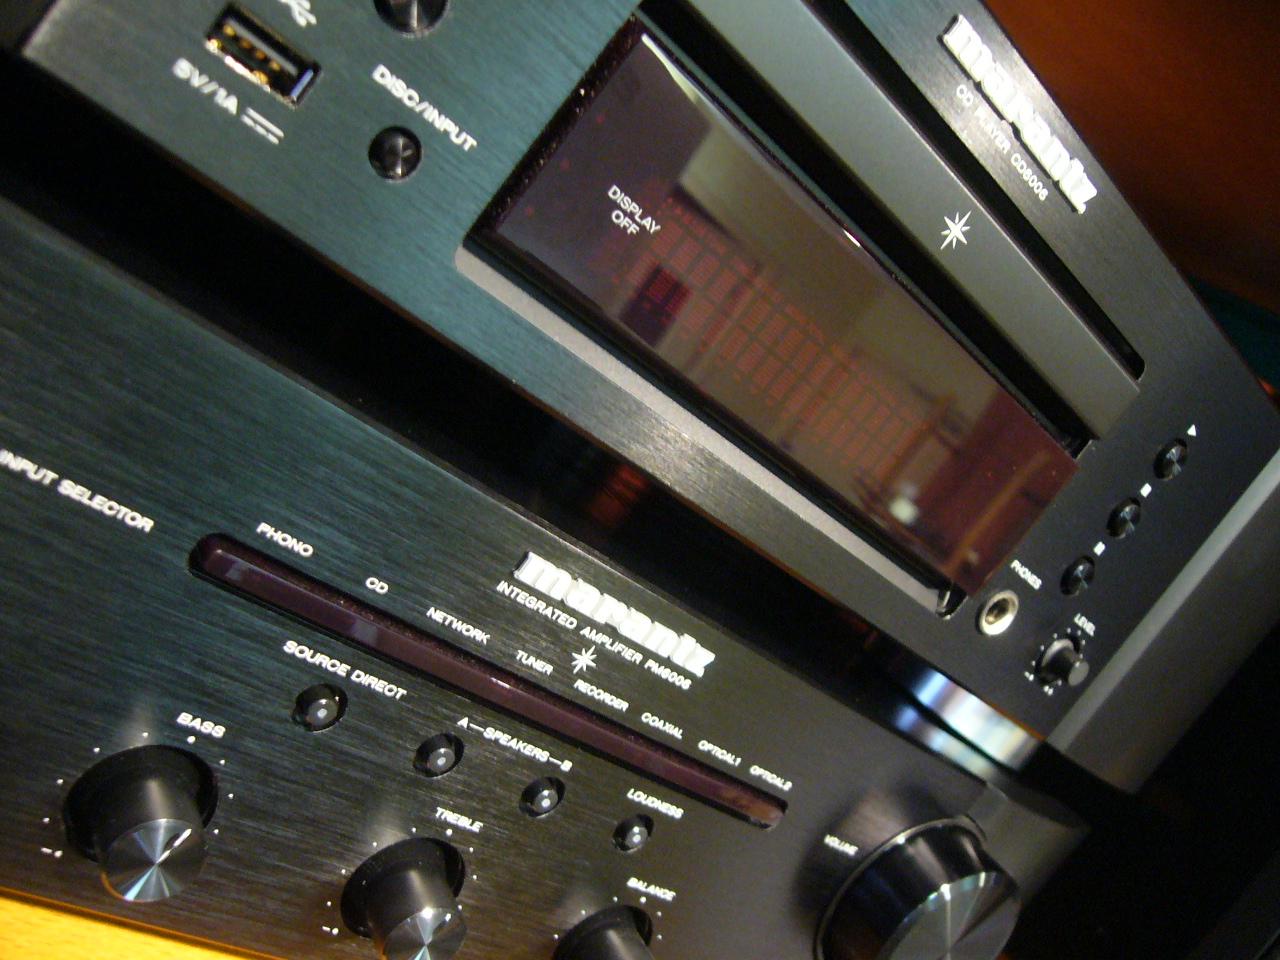 We will also be showing Marantz's AWARD WINNING Hi-Fi the  CD6006  &  PM6006 .